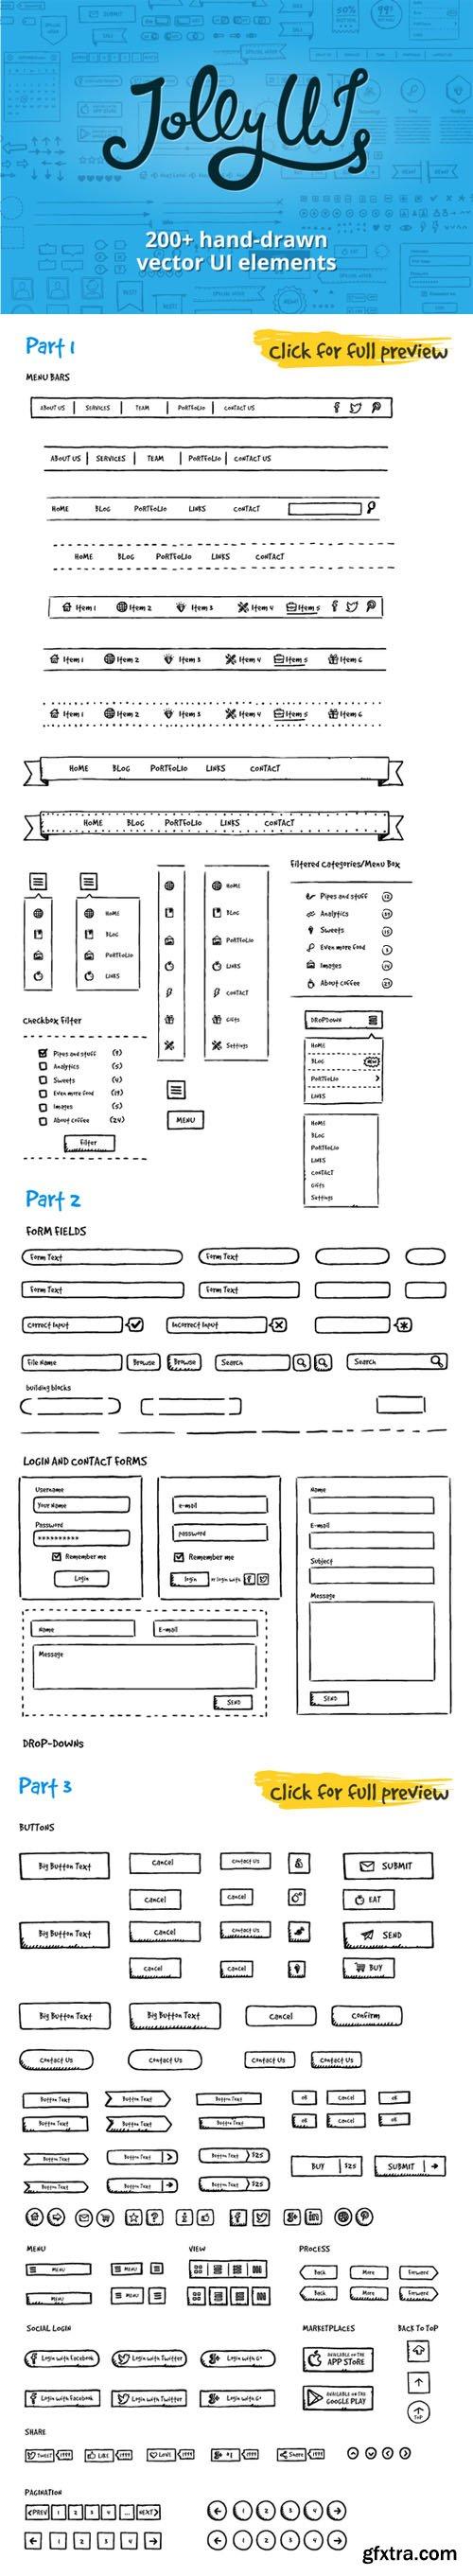 Jolly UI Kit: Hand-drawn UI elements - CM 23094